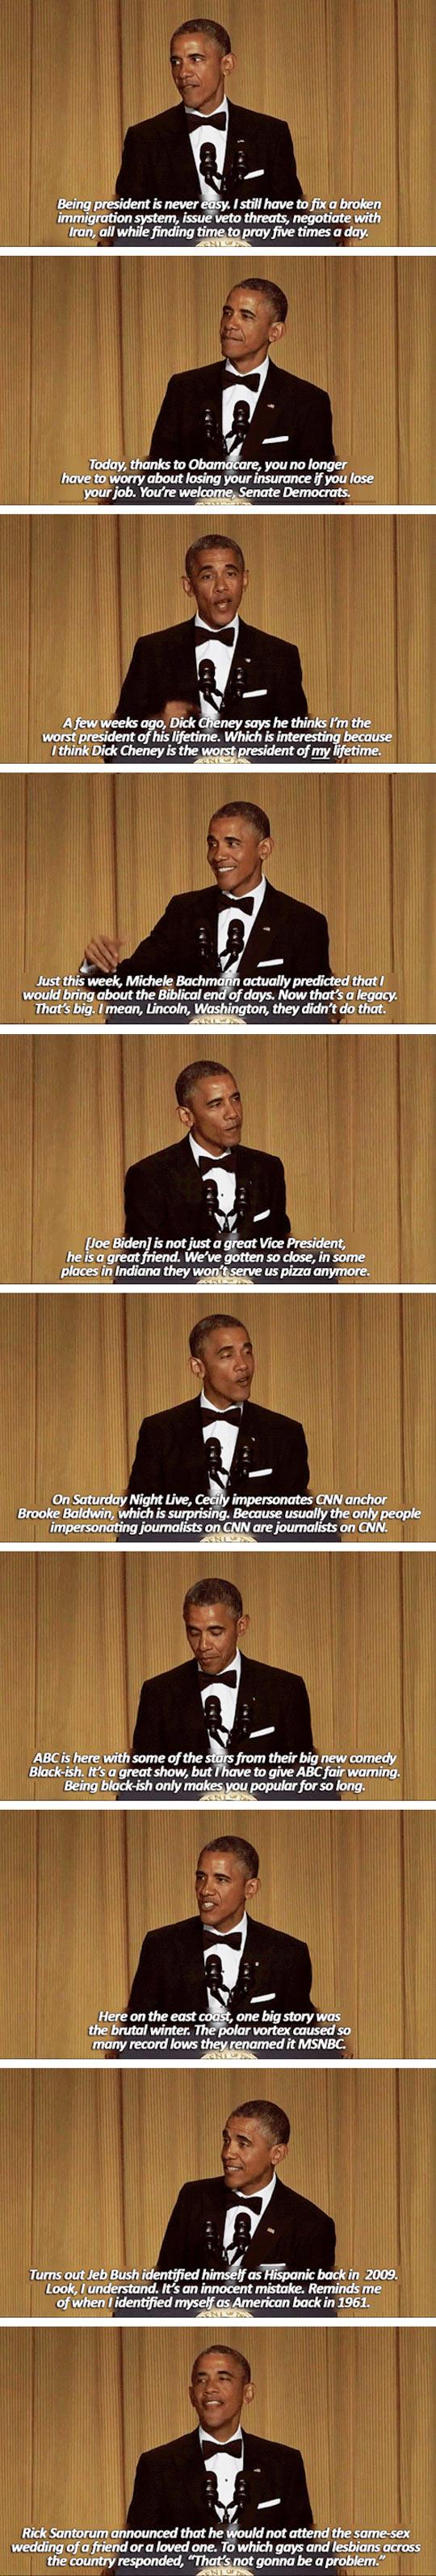 funny-Obama-speech-immigration-system